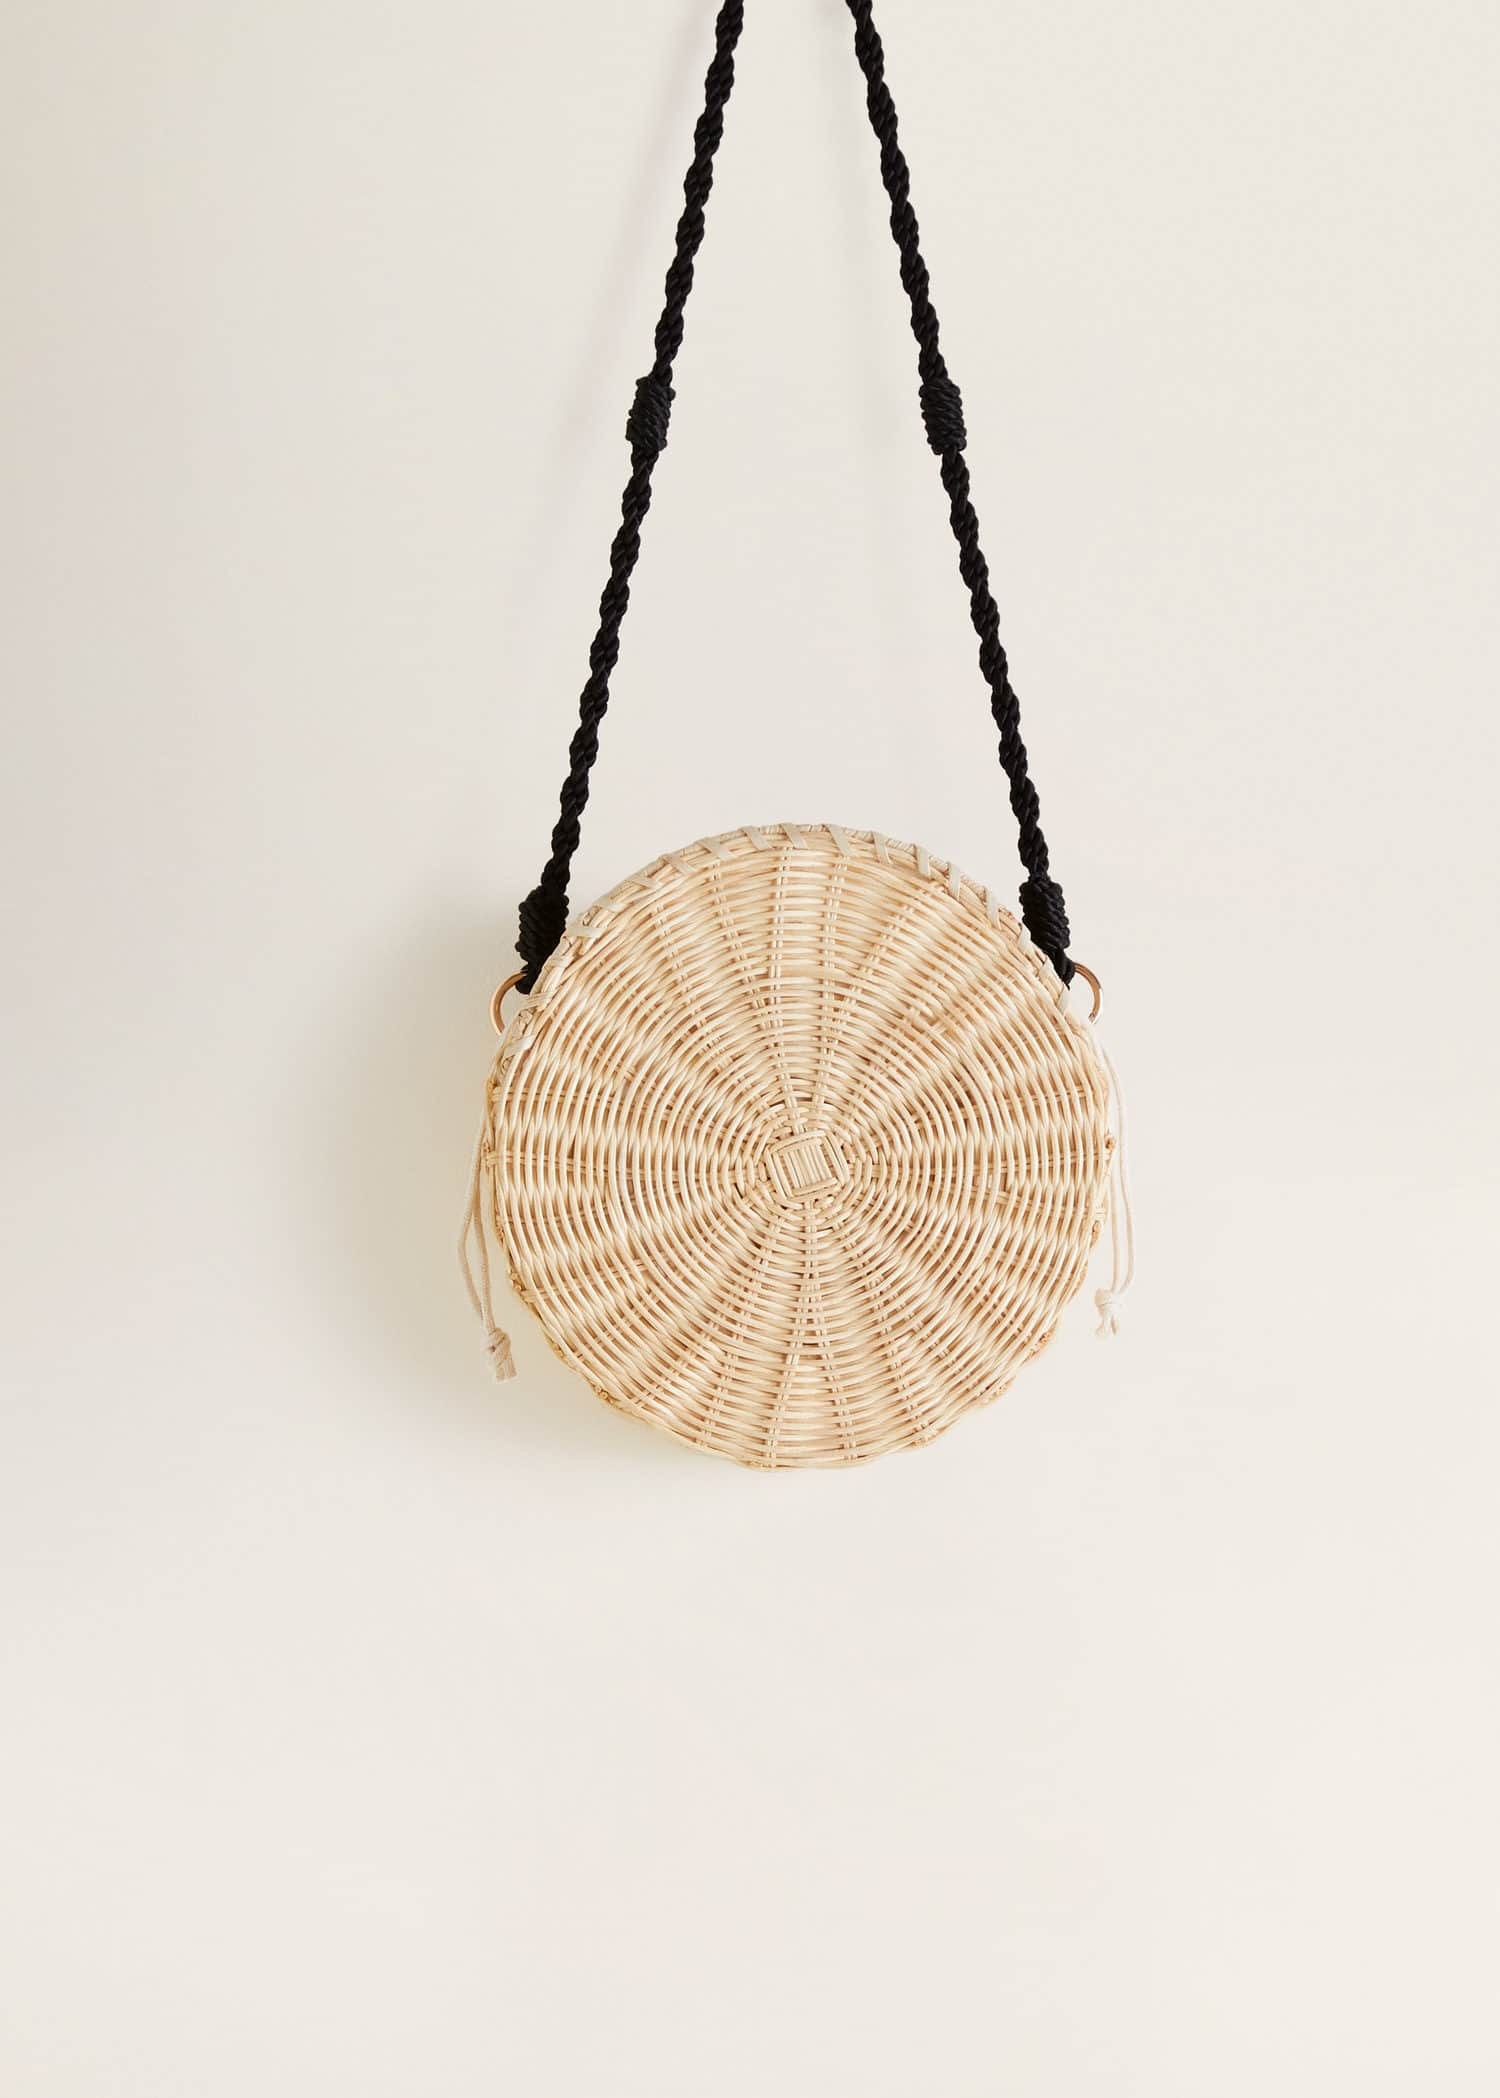 Okrągła bambusowa torebka